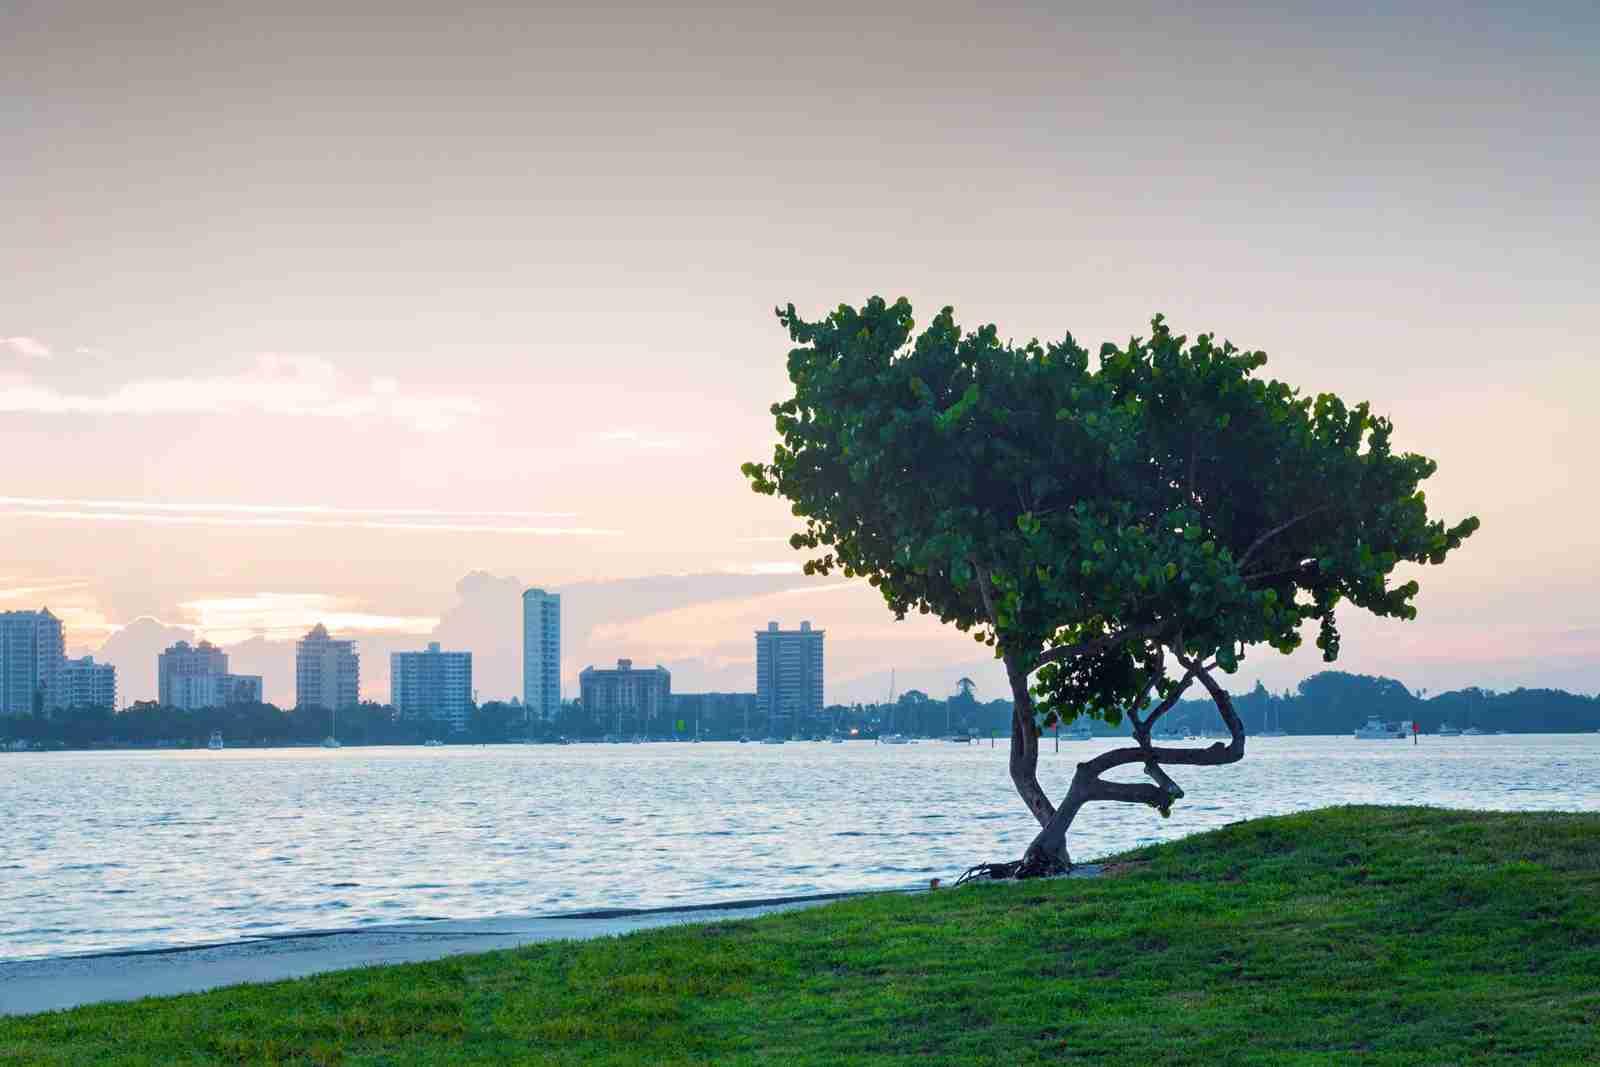 Sarasota, Florida. (Photo by John Coletti/Getty Images)